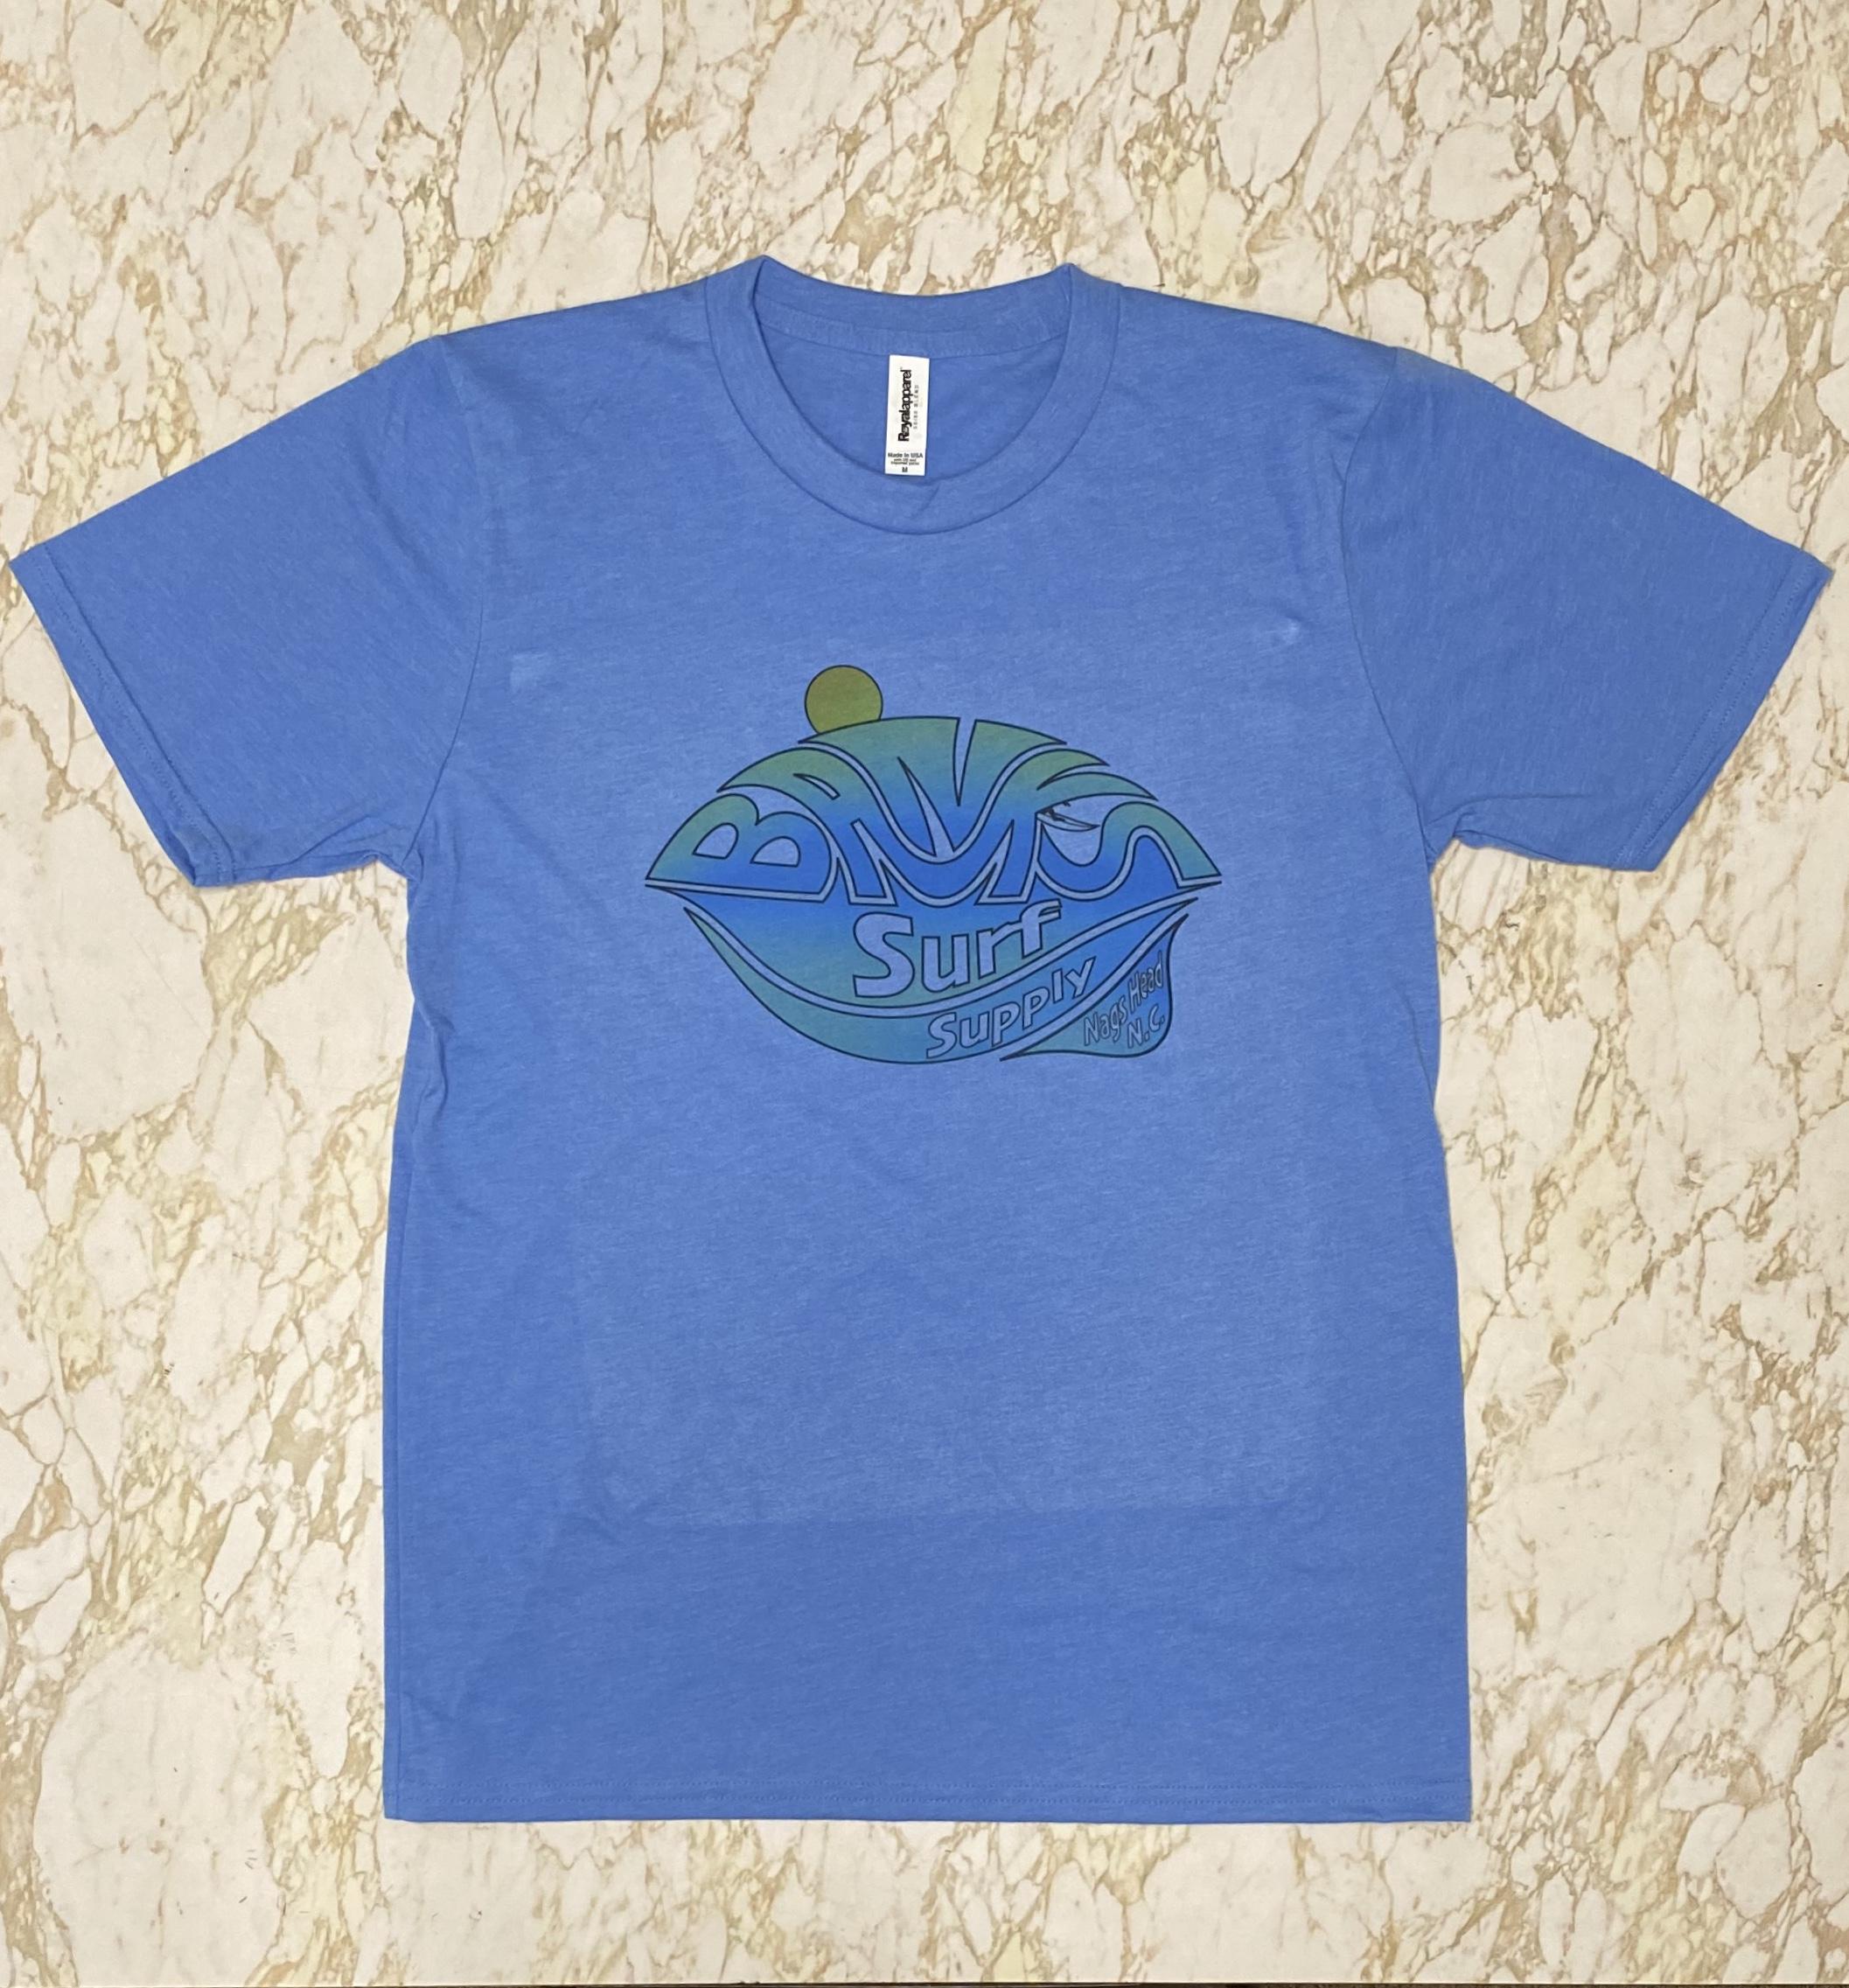 Banks Surf Supply A-Frame Short Sleeve Tee Heather Light Blue